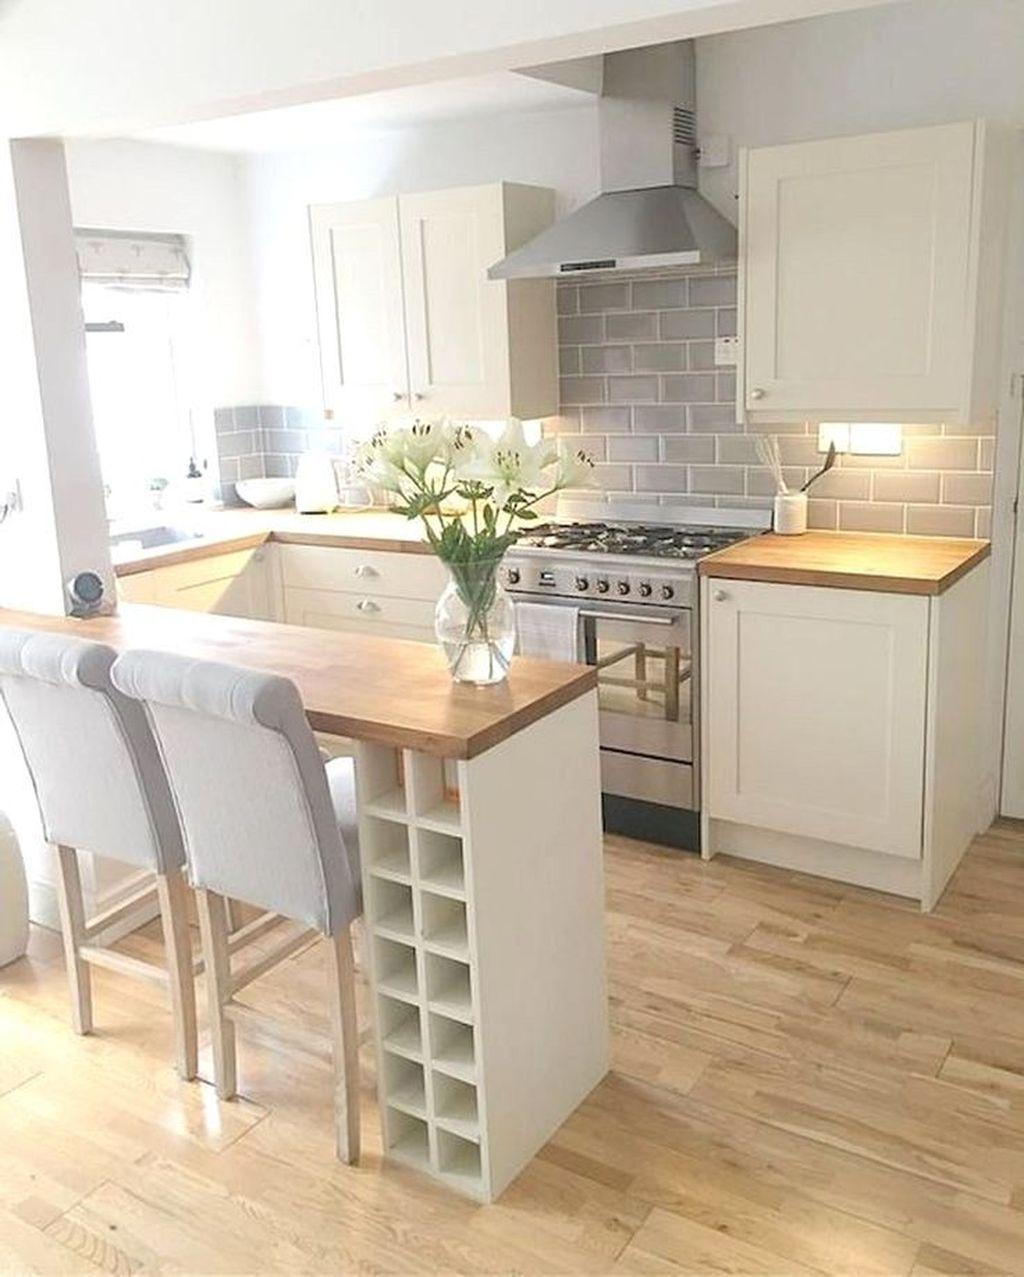 Popular Apartment Kitchen Design Ideas You Should Copy 26